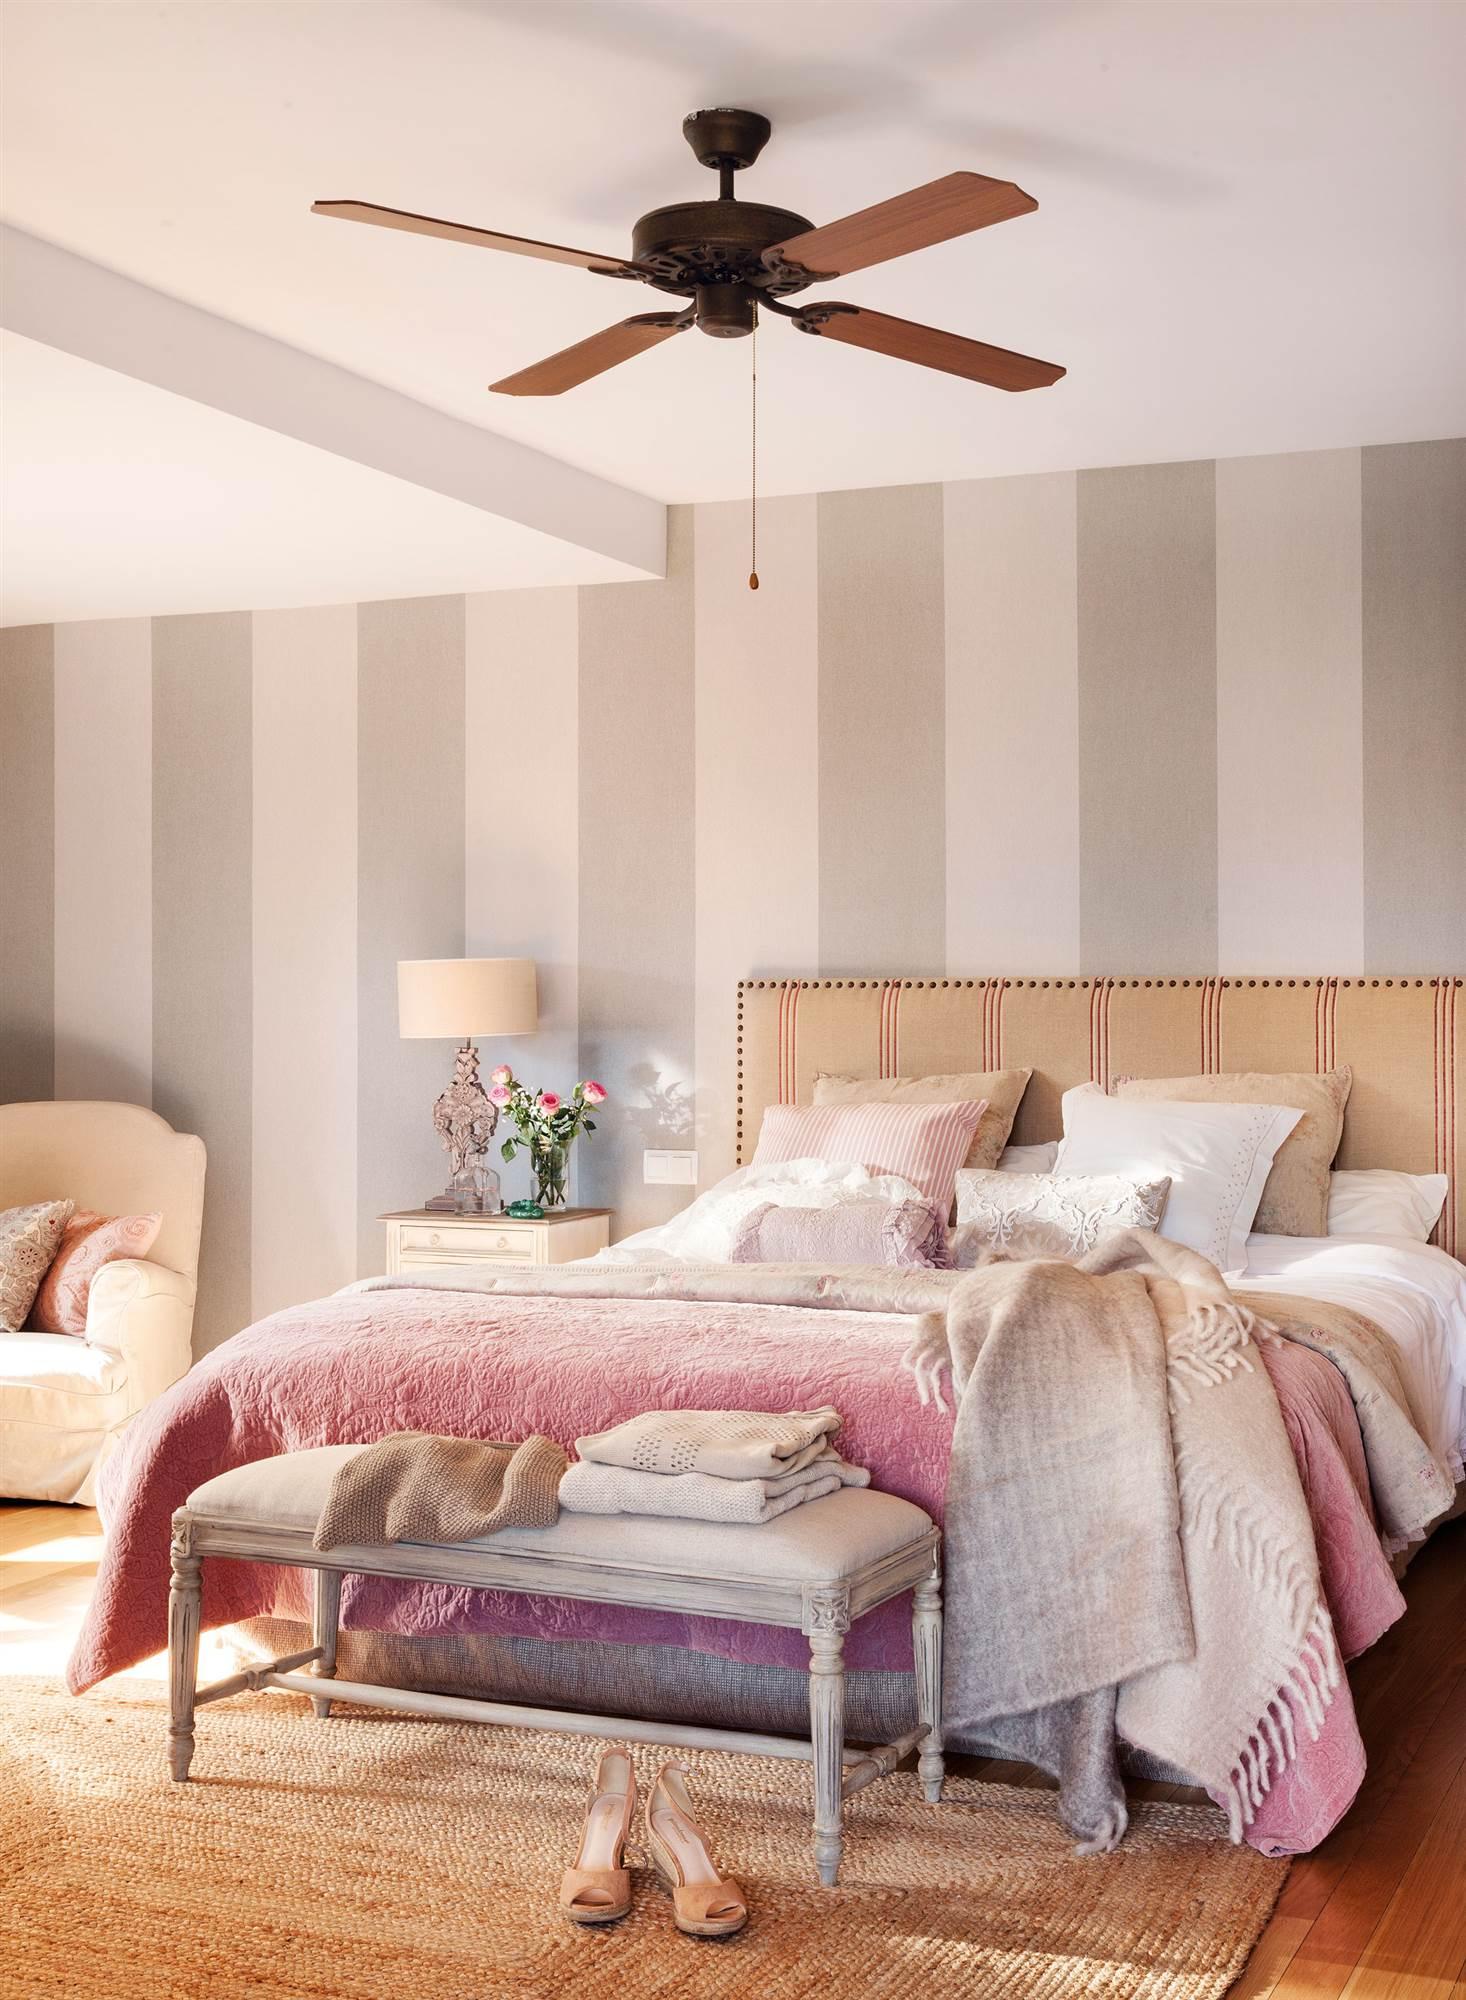 Como tapizar una pared gallery of saln con pared enterada for Papel para tapizar paredes